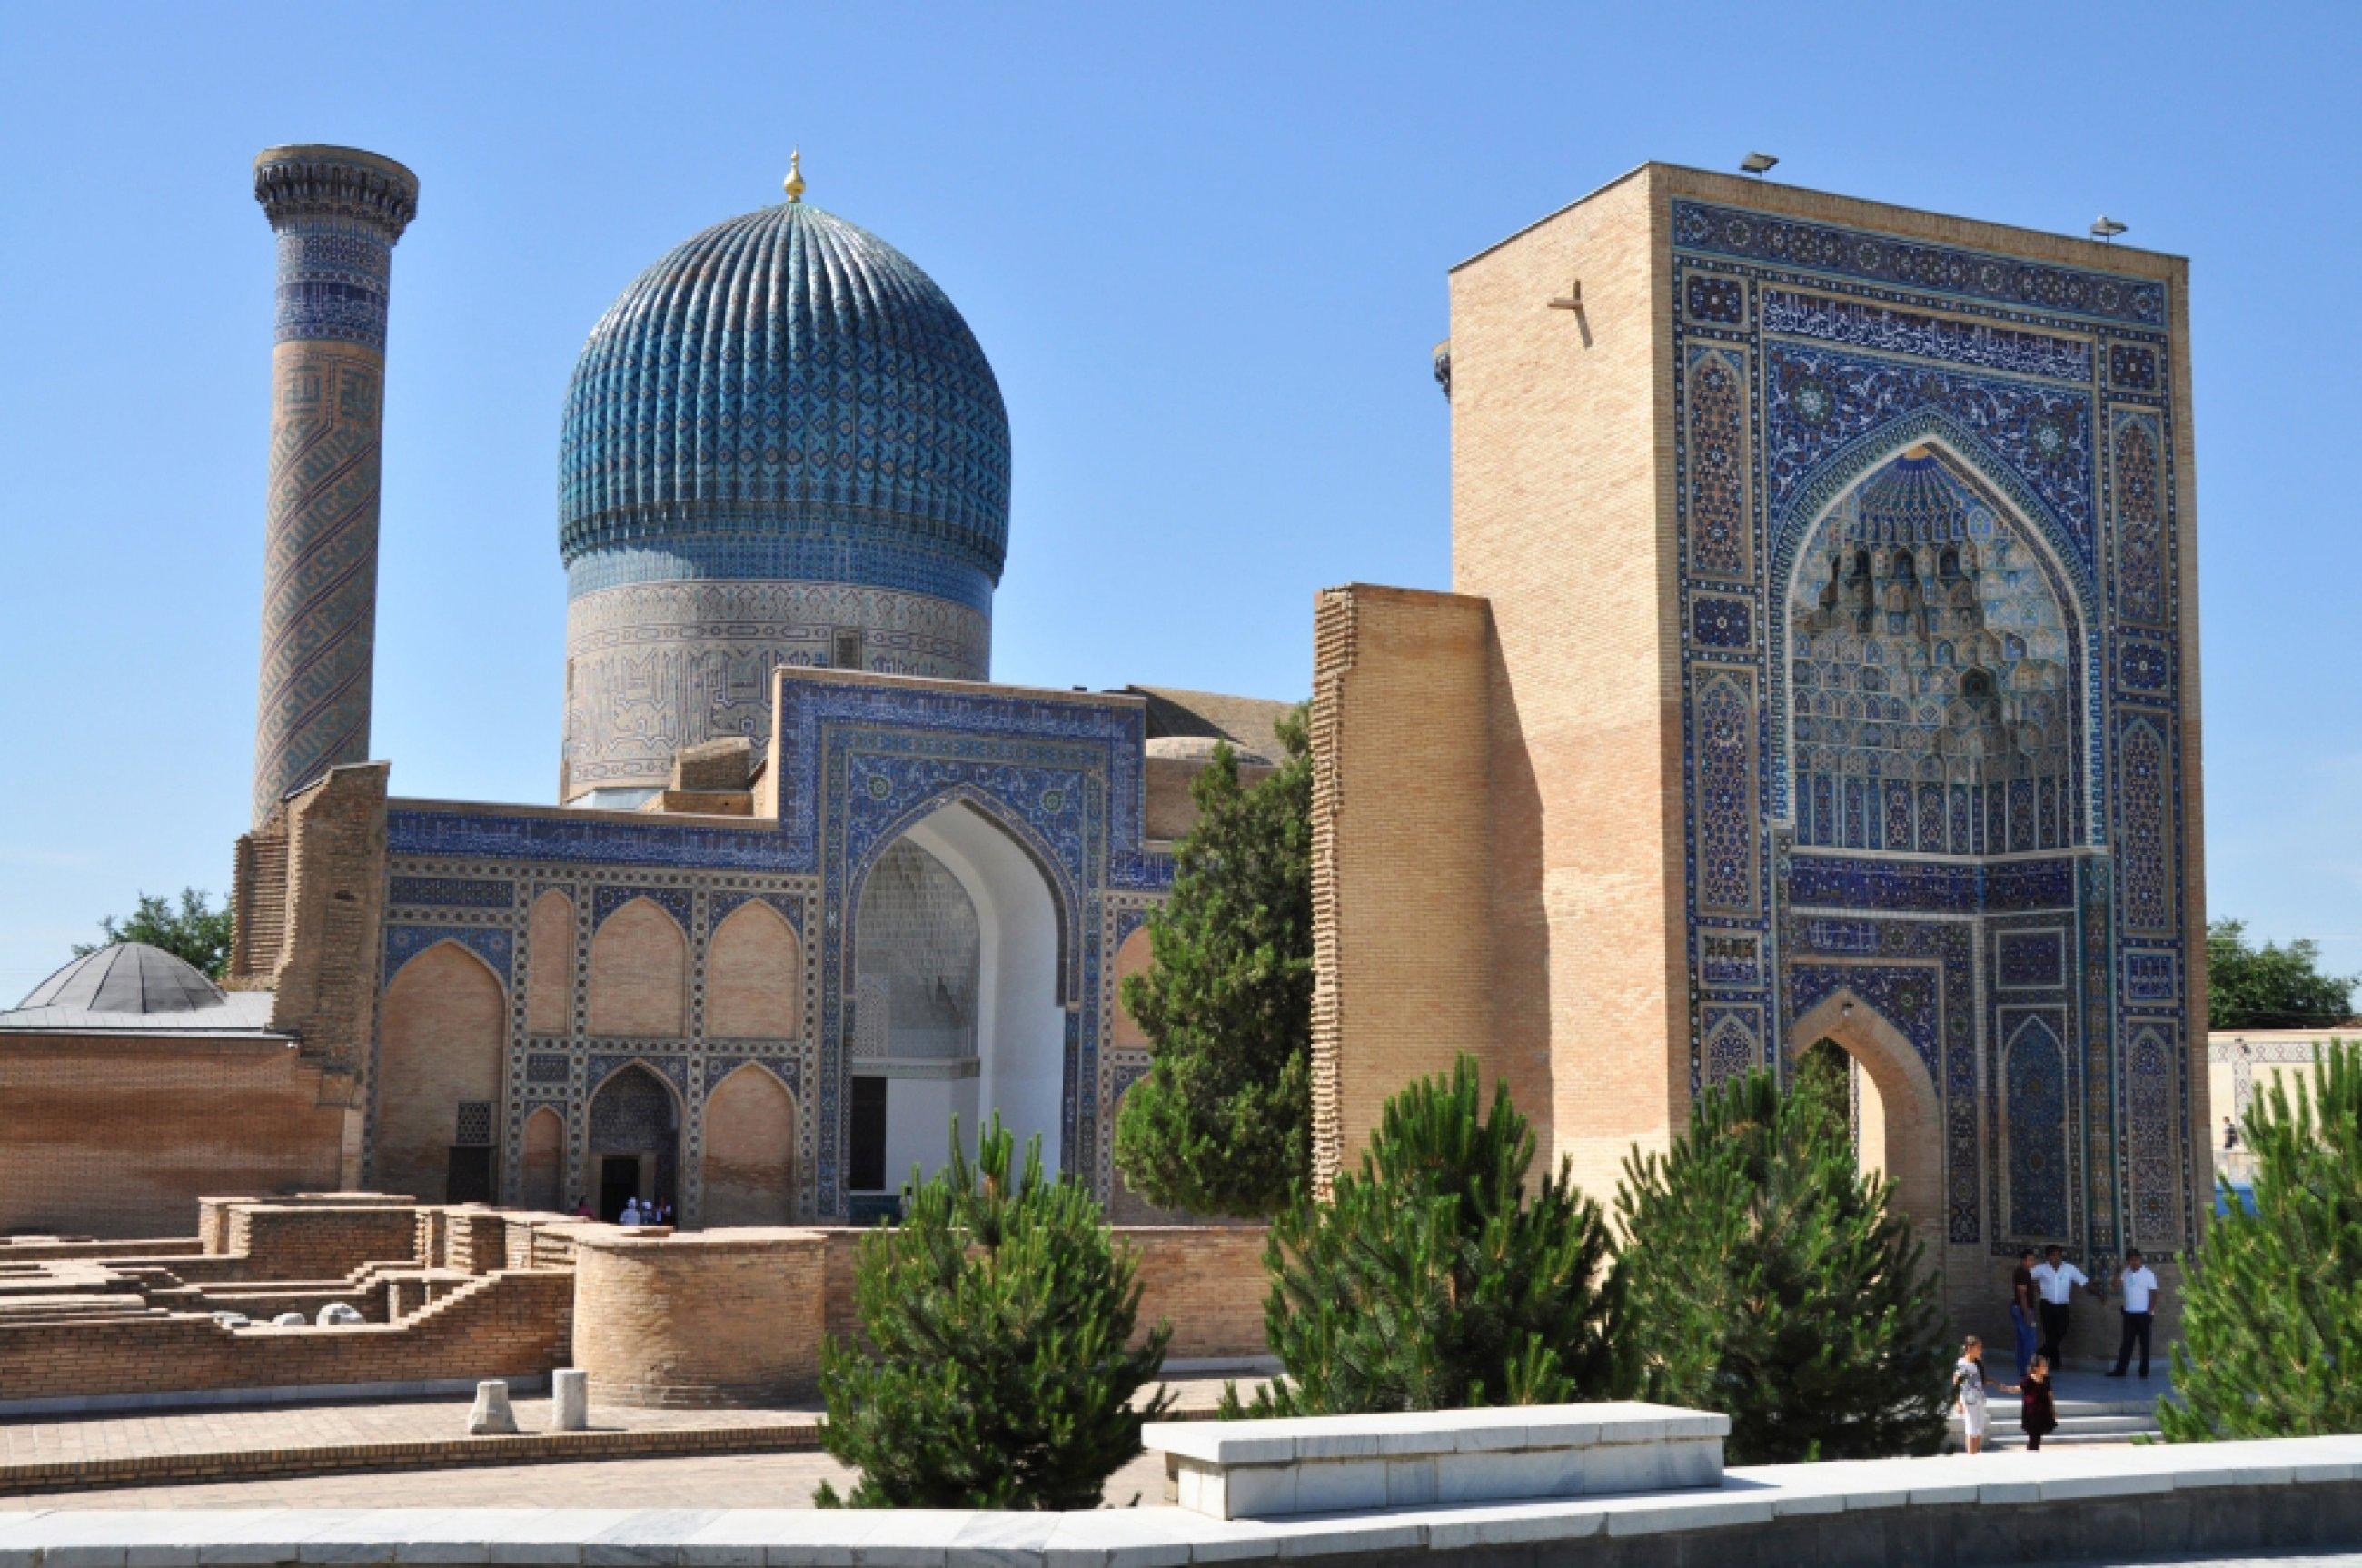 https://bubo.sk/uploads/galleries/7500/uzbekistan-12.jpg